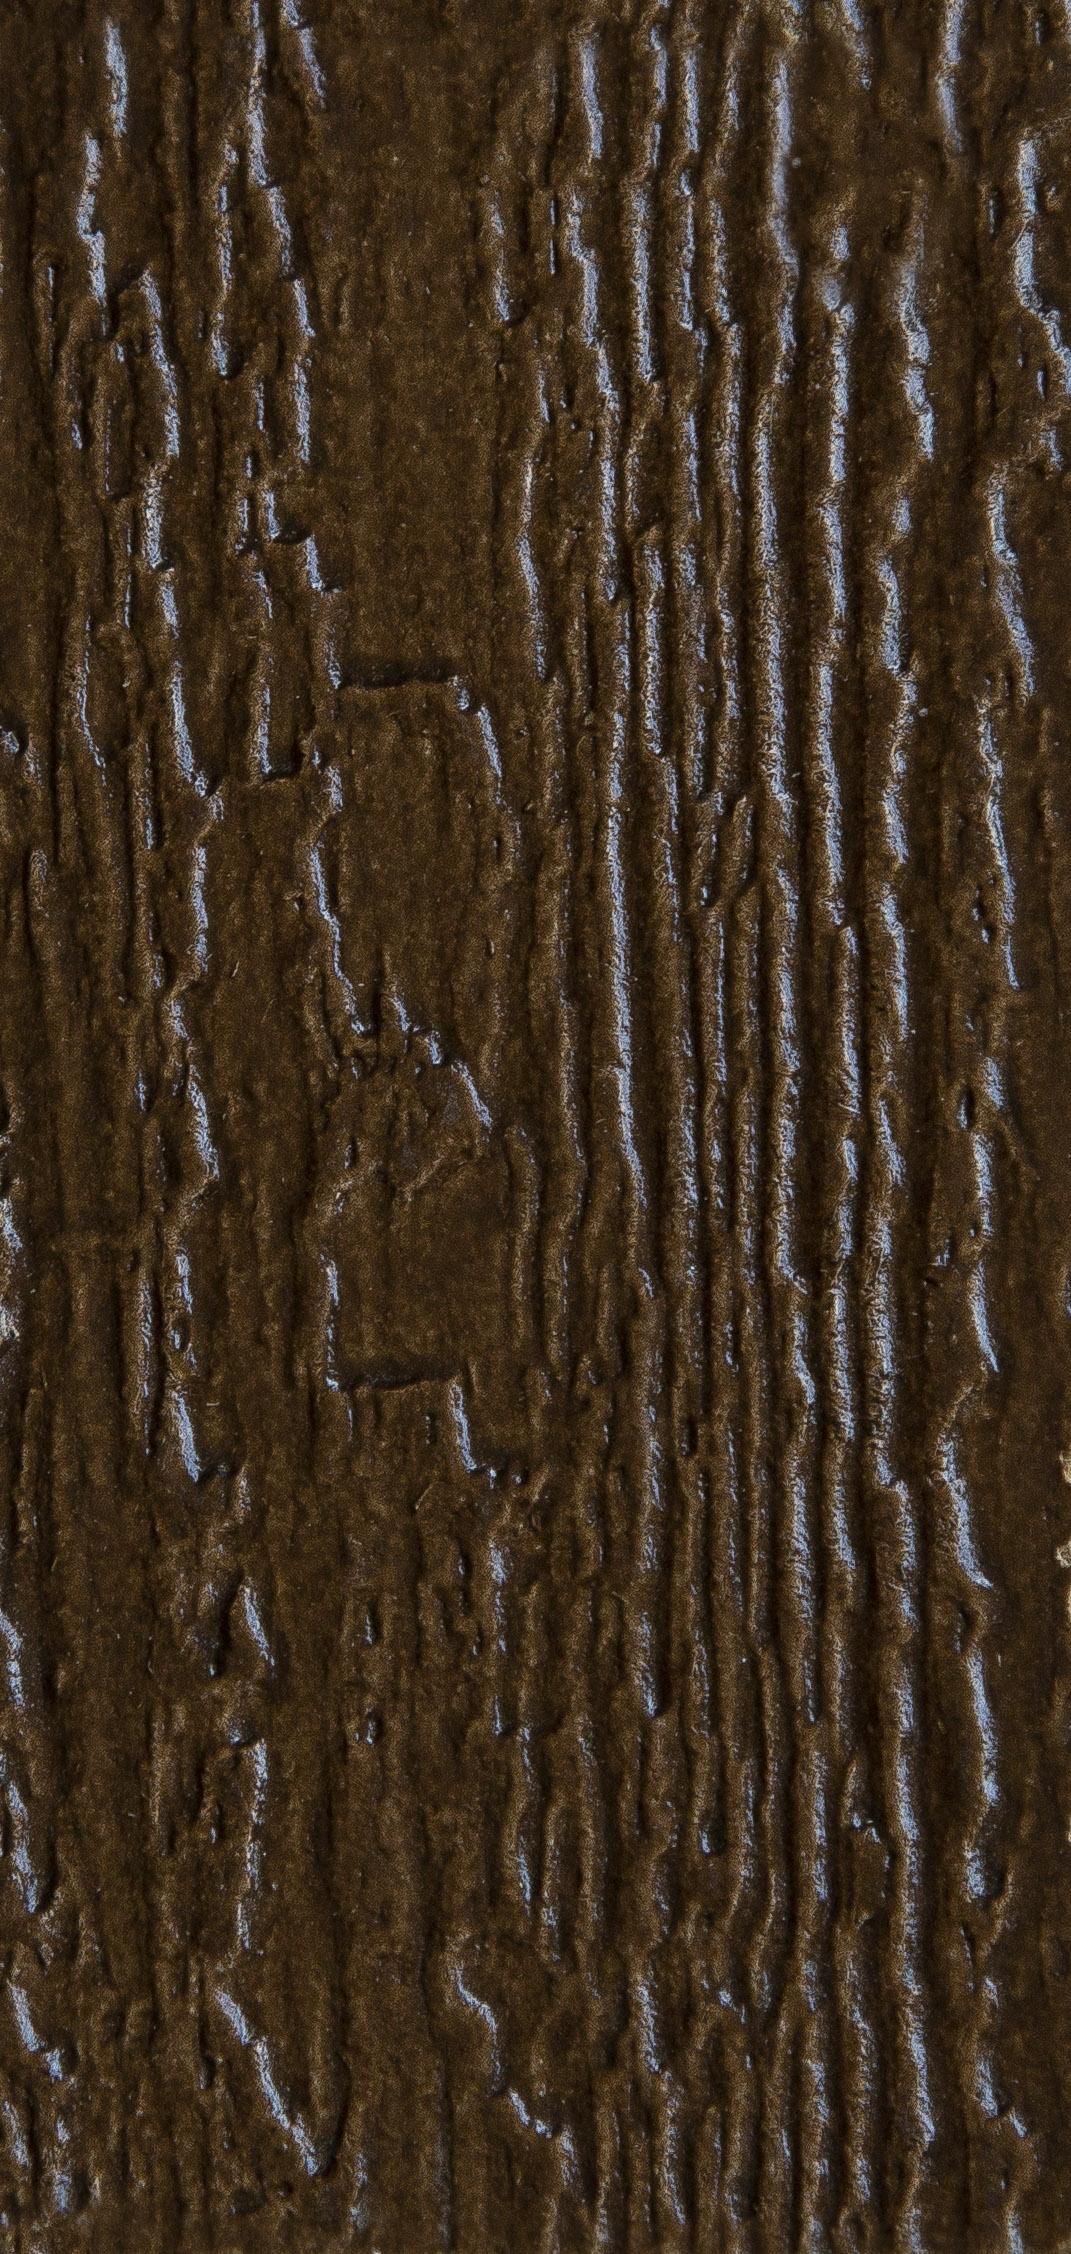 chestnutbrown.jpg